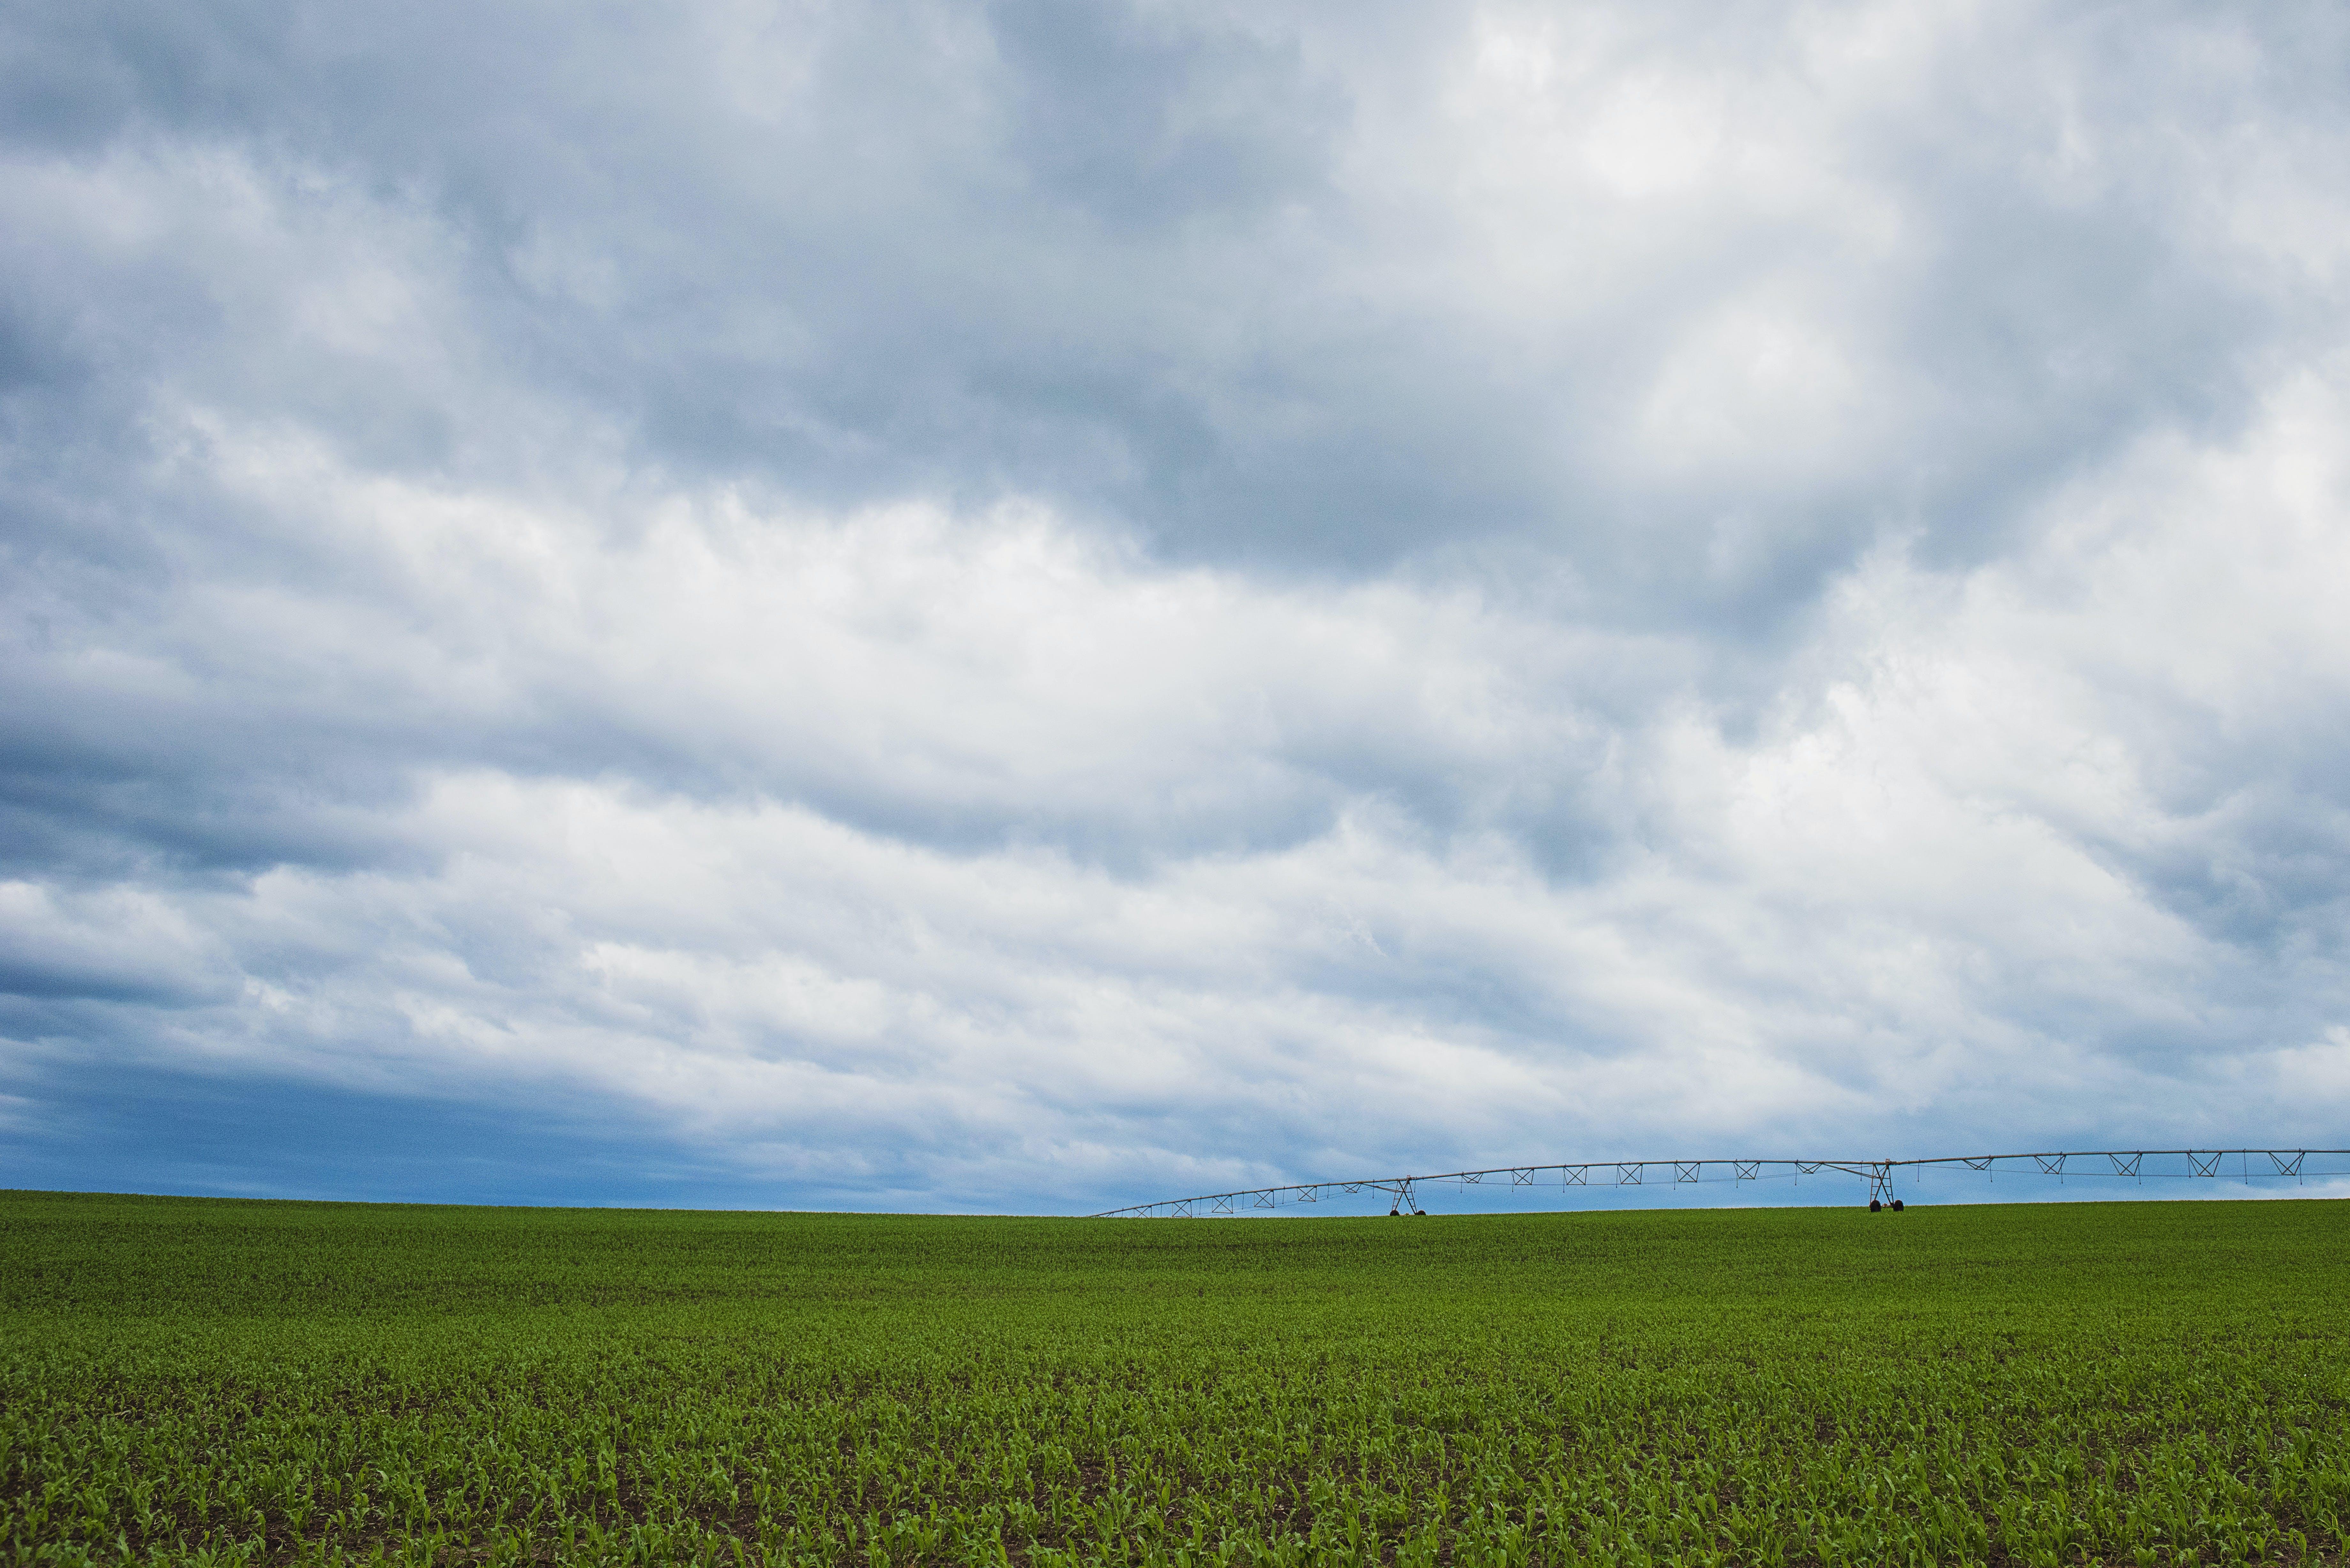 Green Grass Field Under Cumulonimbus Clouds